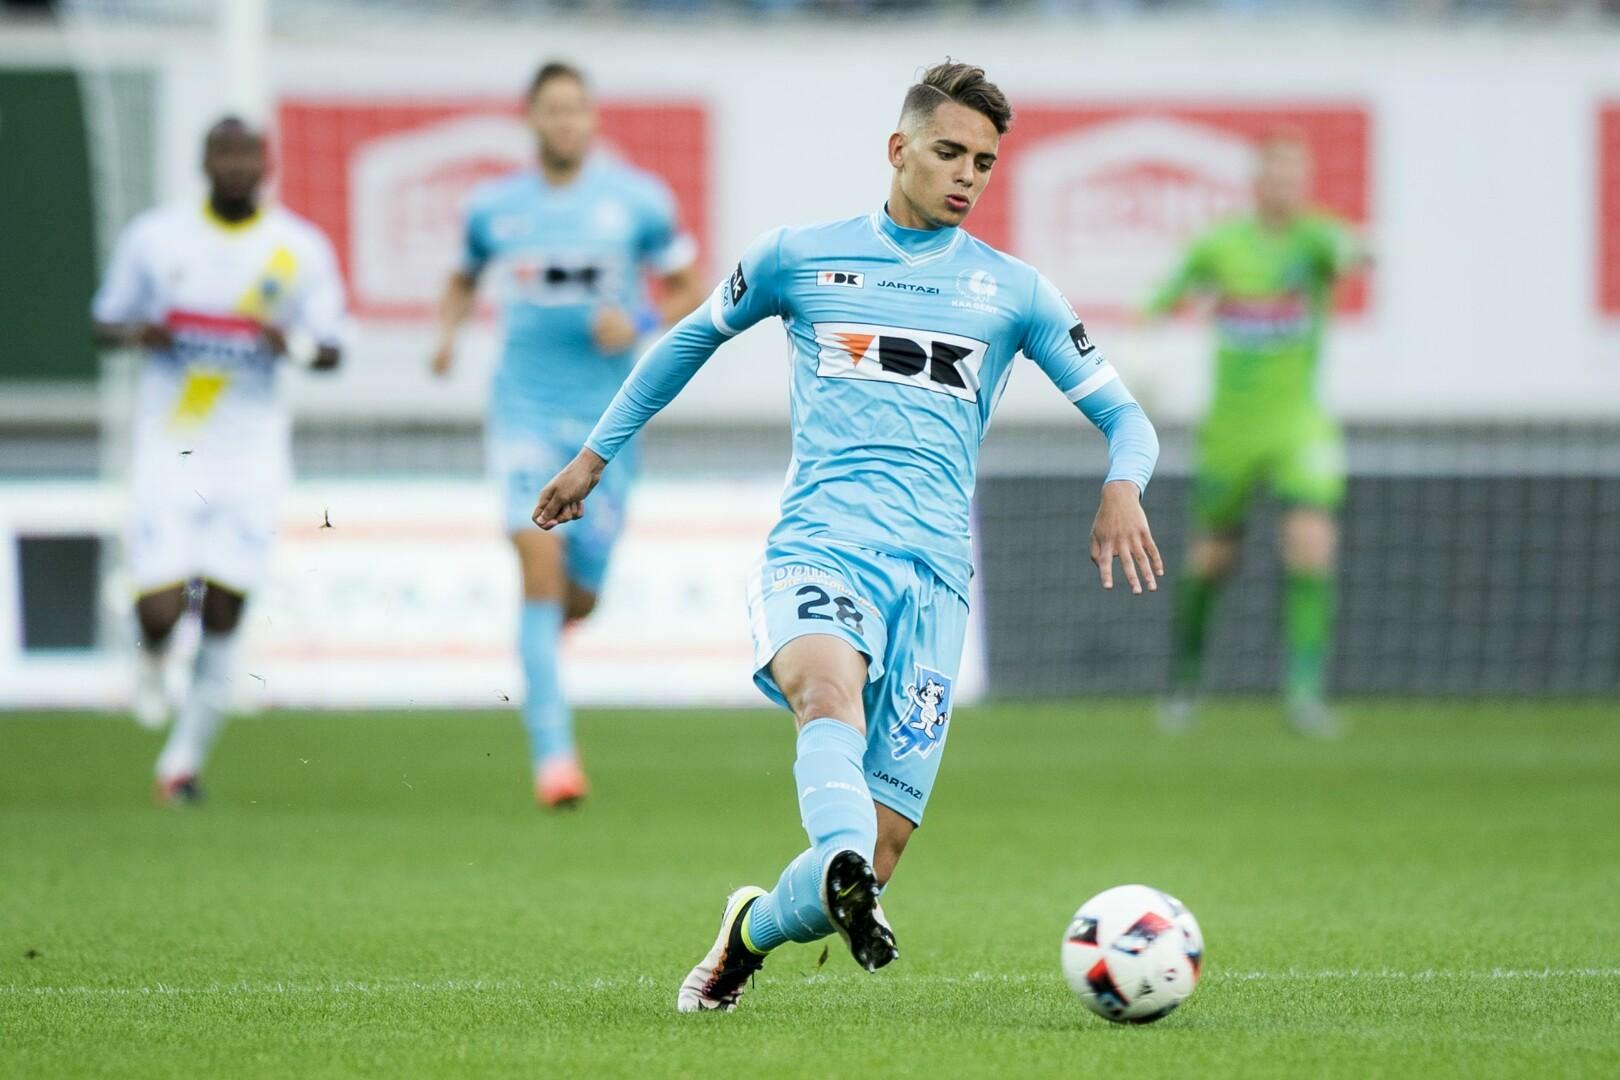 Siebe Horemans en Lucas Schoofs uitgeleend aan OHL